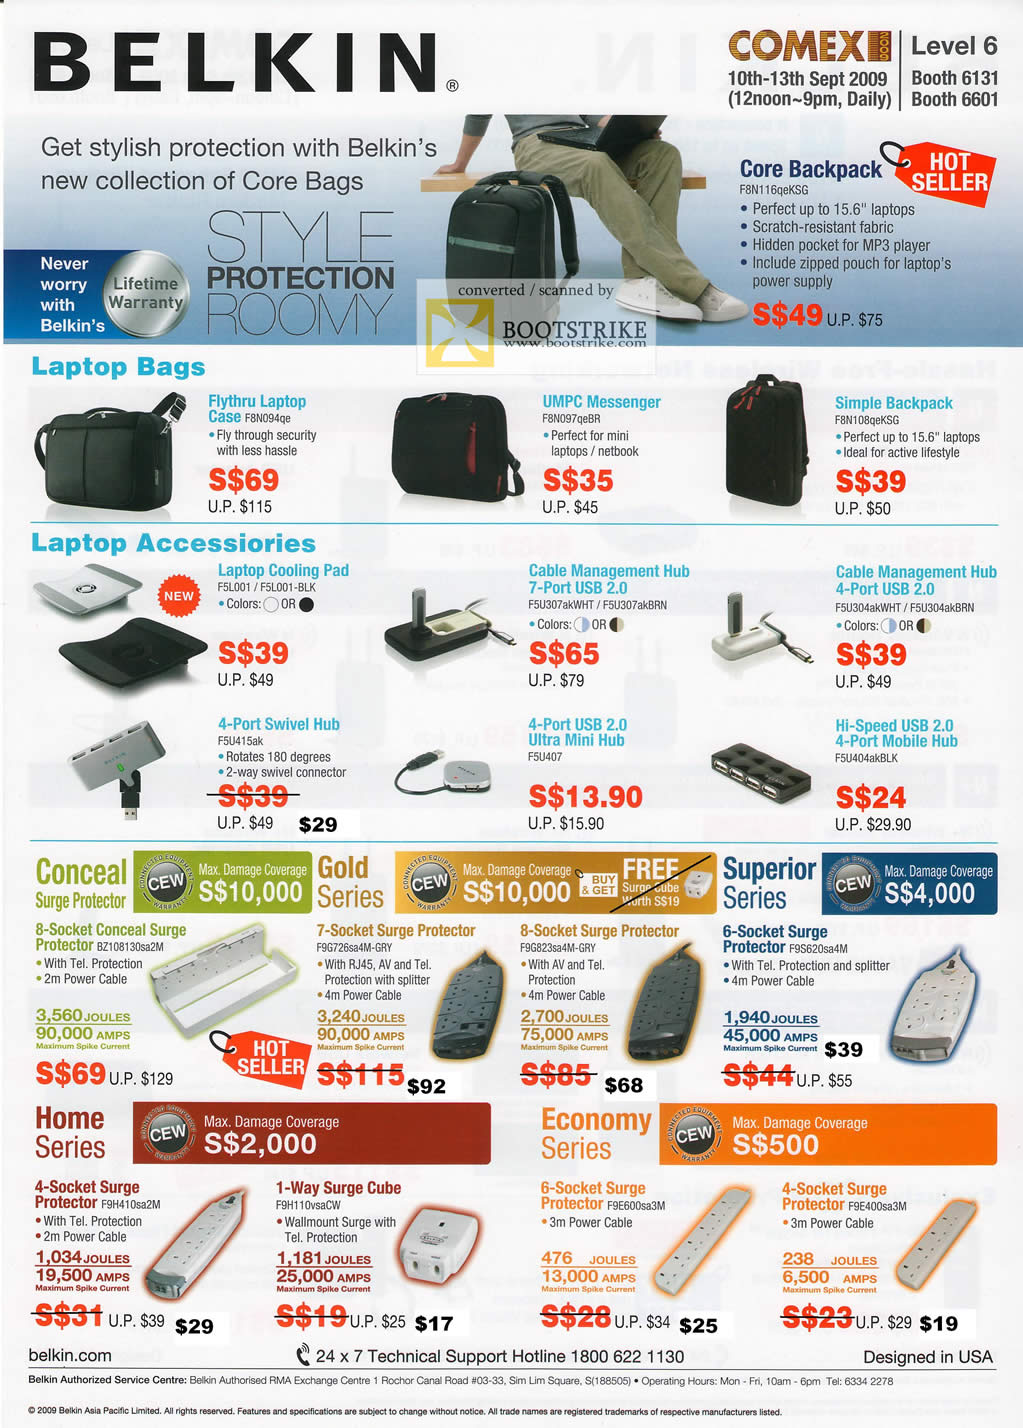 Comex 2009 price list image brochure of Belkin Laptop Bags Accessories Surge Protector